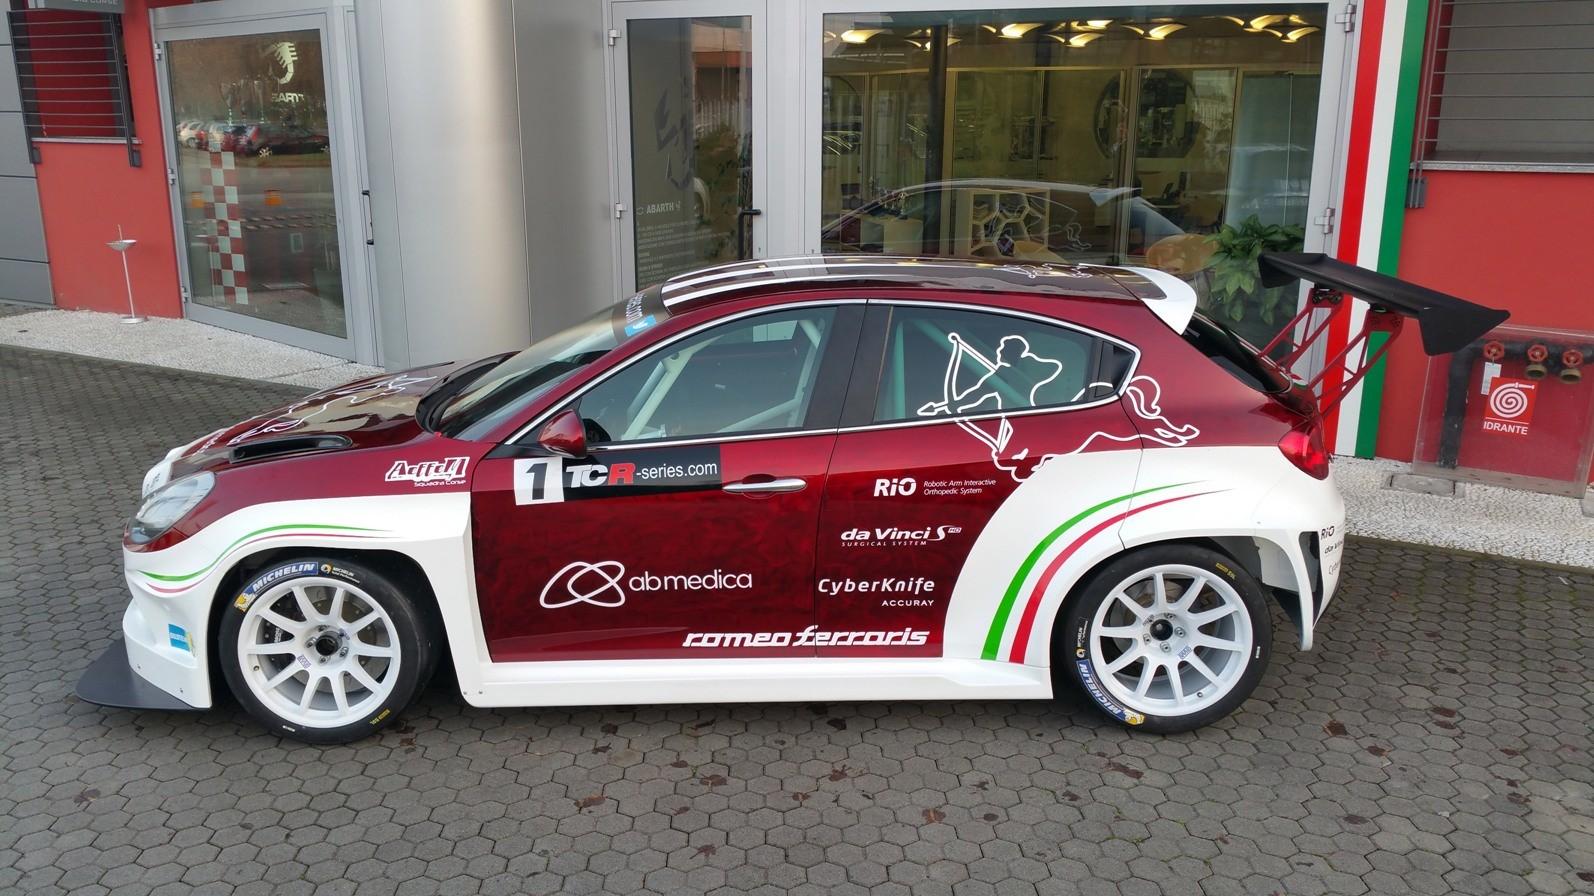 Alfa Romeo Giulietta TCR By Romeo Ferraris Will Race In